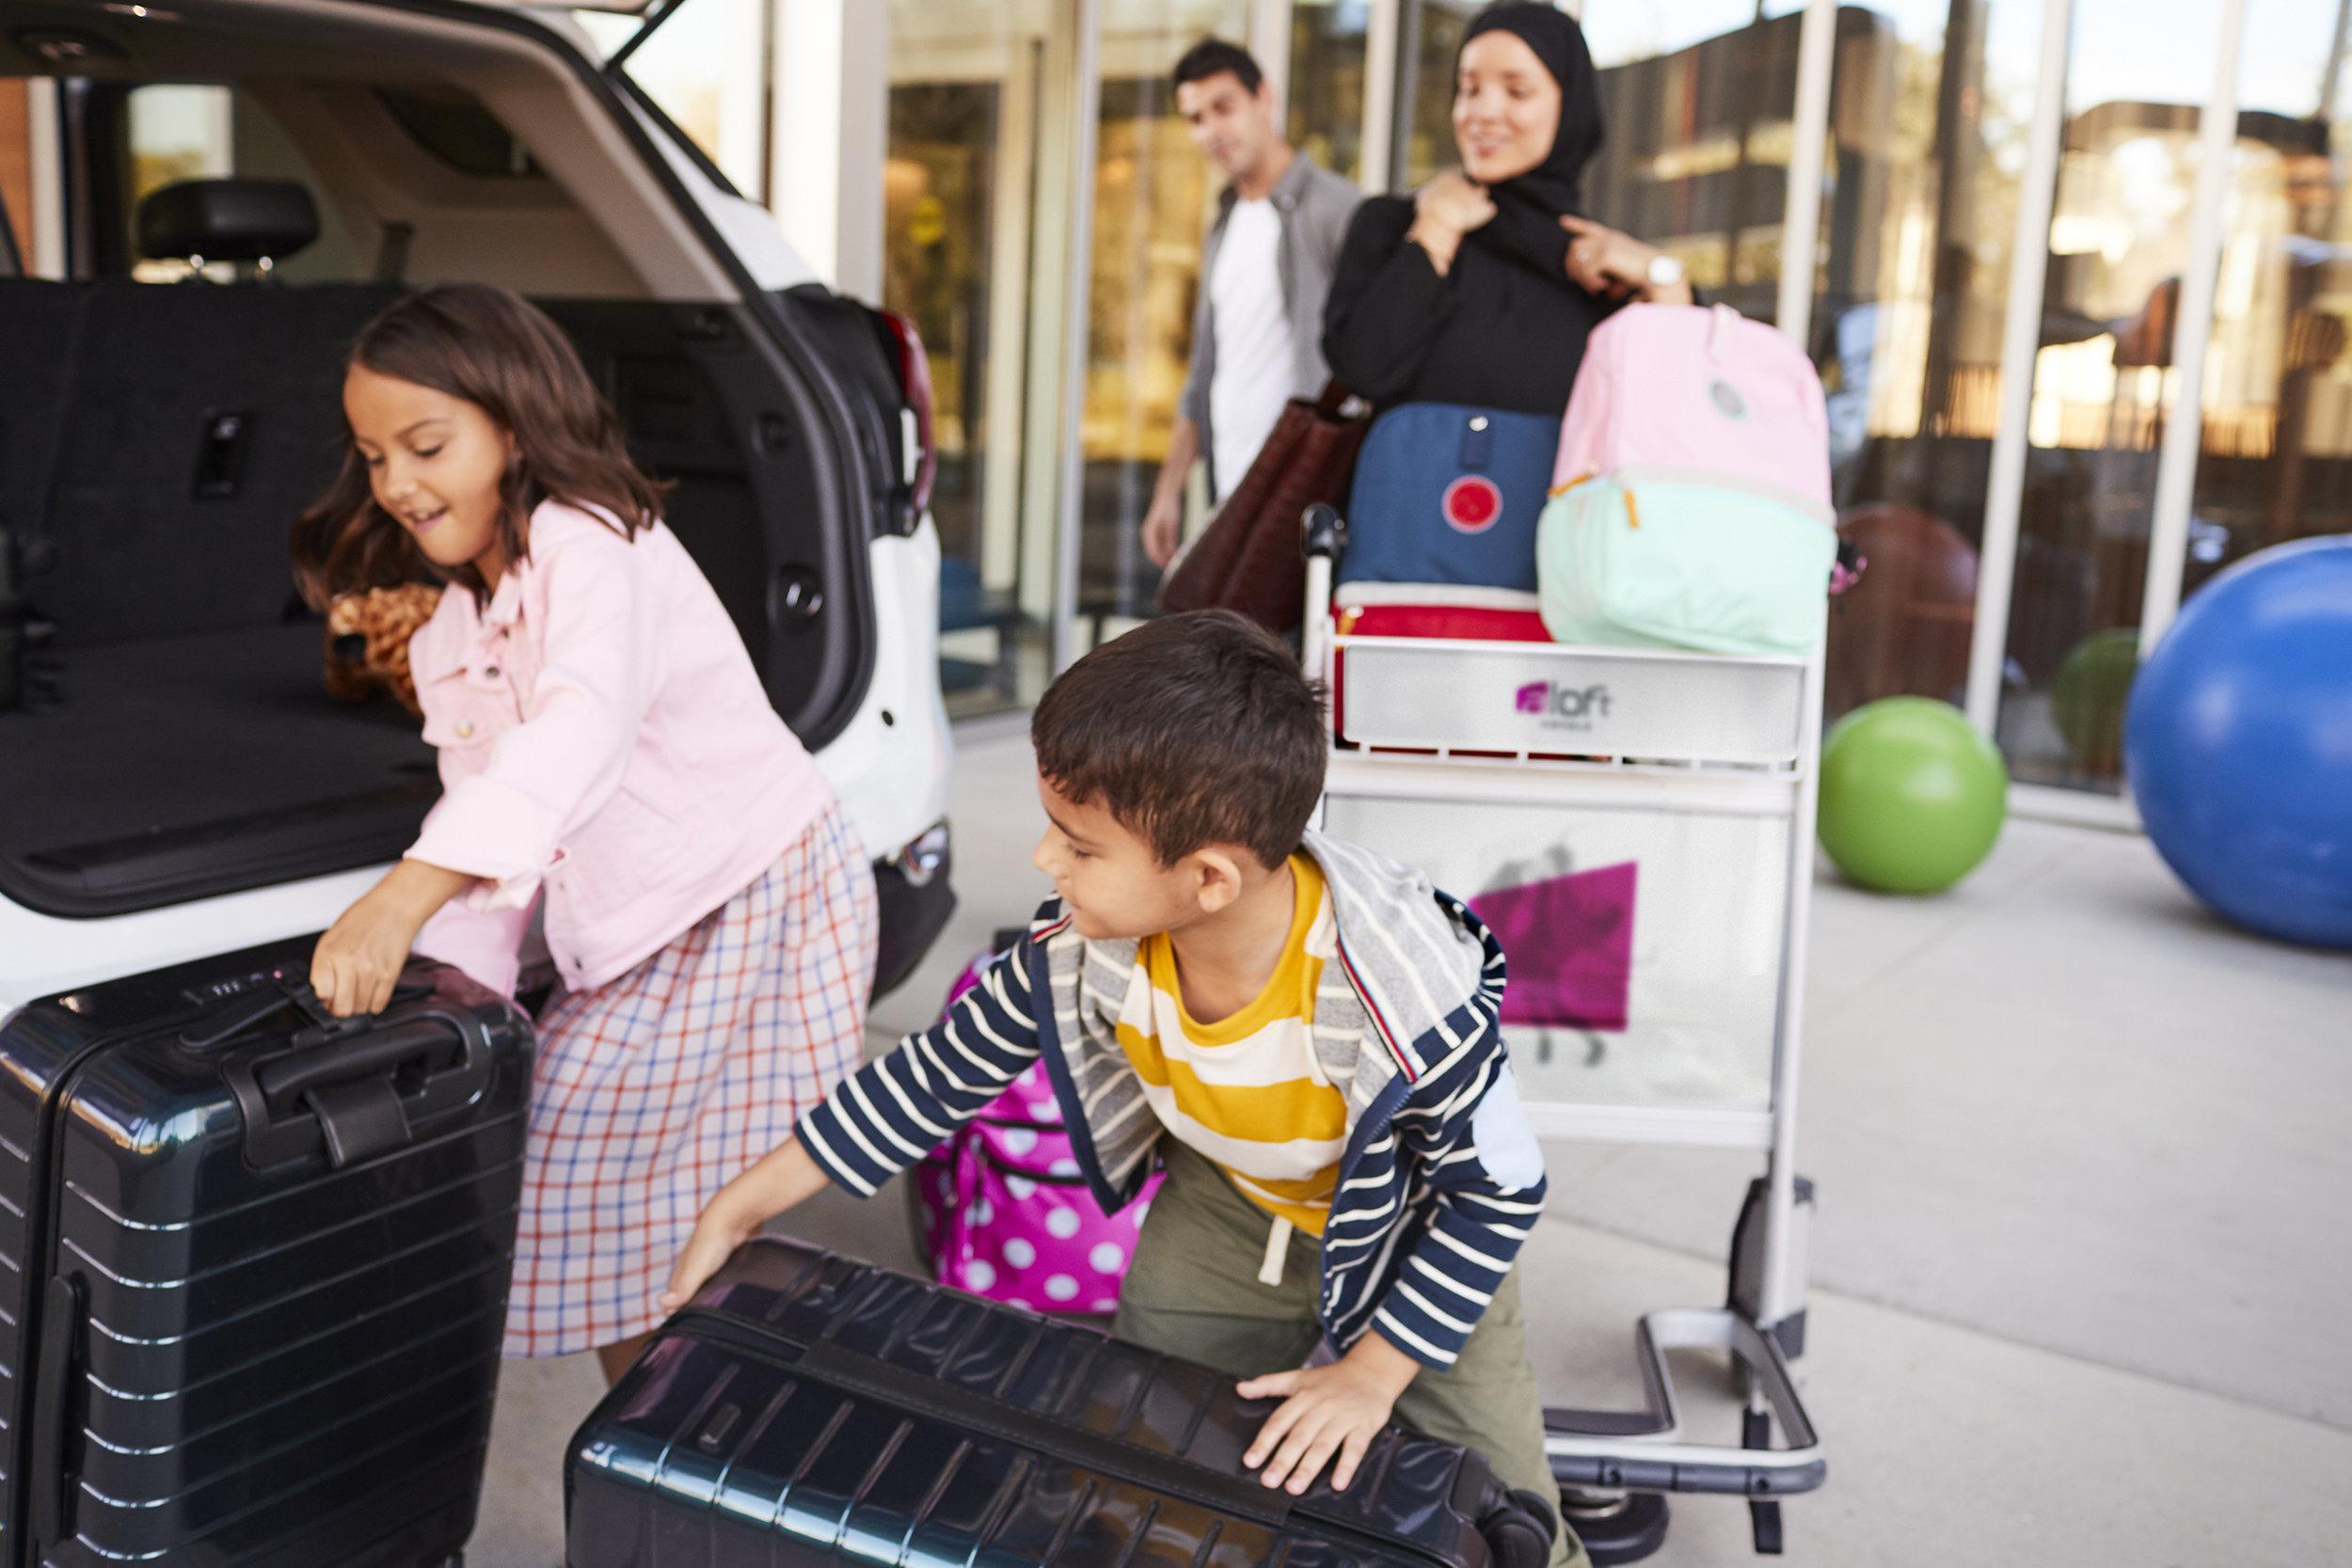 OUTSIDE_HOTEL_MEA_FAMILY_MOM_DAD_KID1_KID2_127_V6.jpg